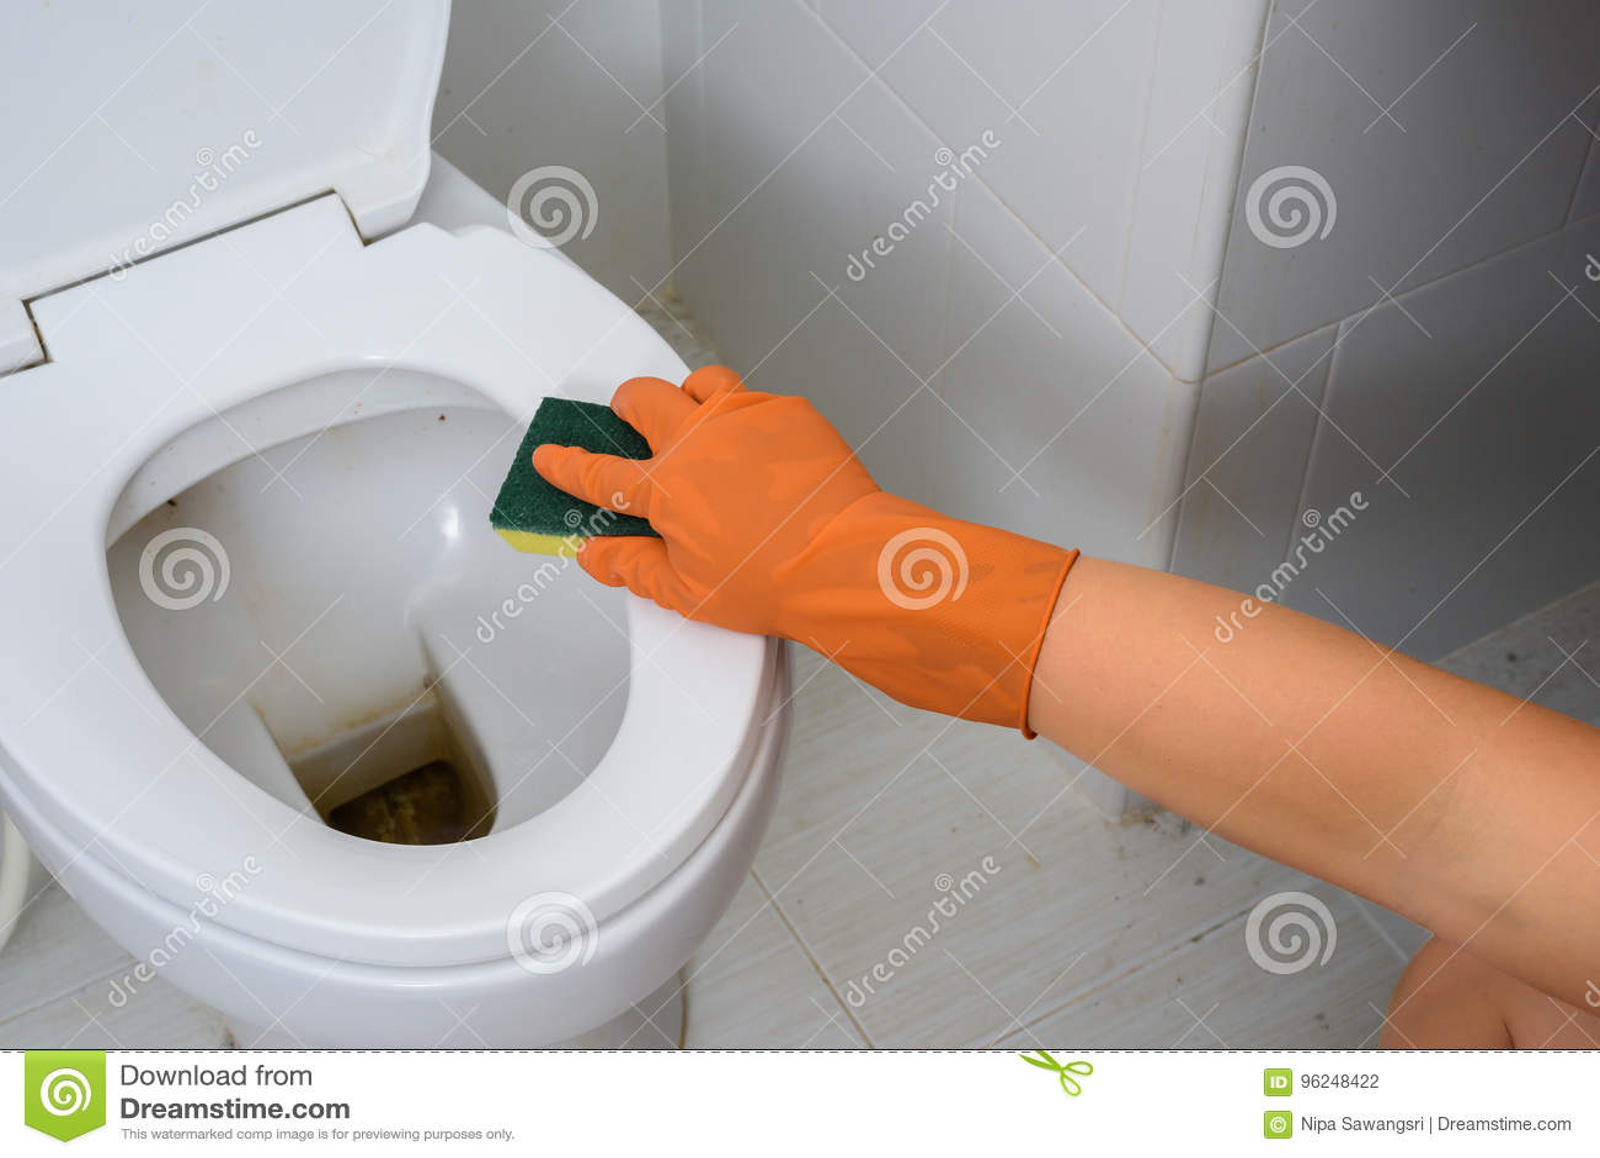 Mãos nas luvas alaranjadas que limpam WC, toalete, lavabos